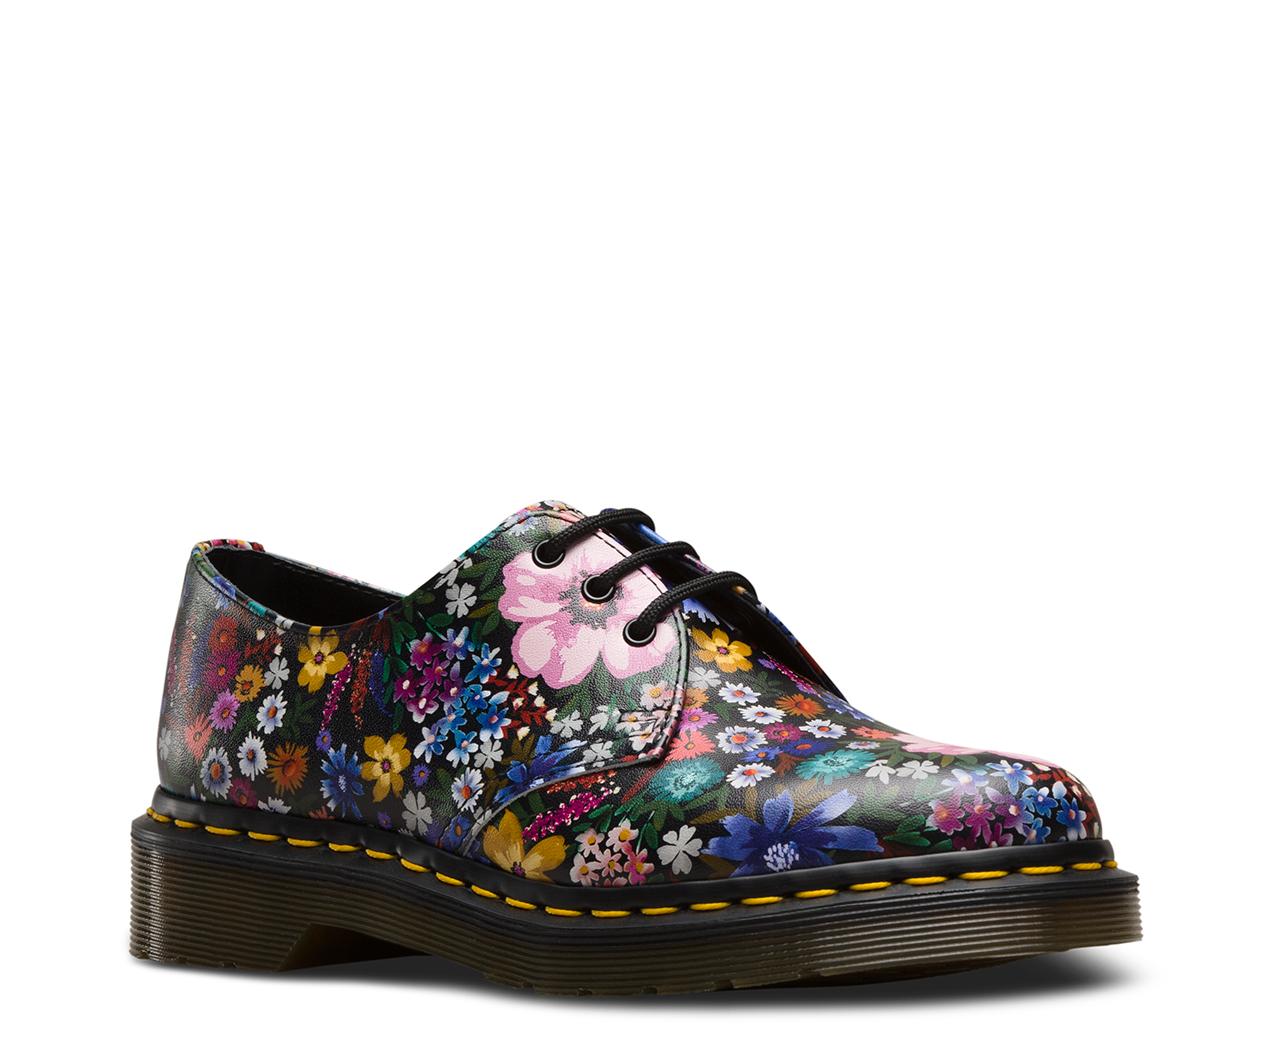 Dr.Martens Womens 8065 Wanderlust Bone Mallow Pink Leather Shoes 38 EU Mppy5P1